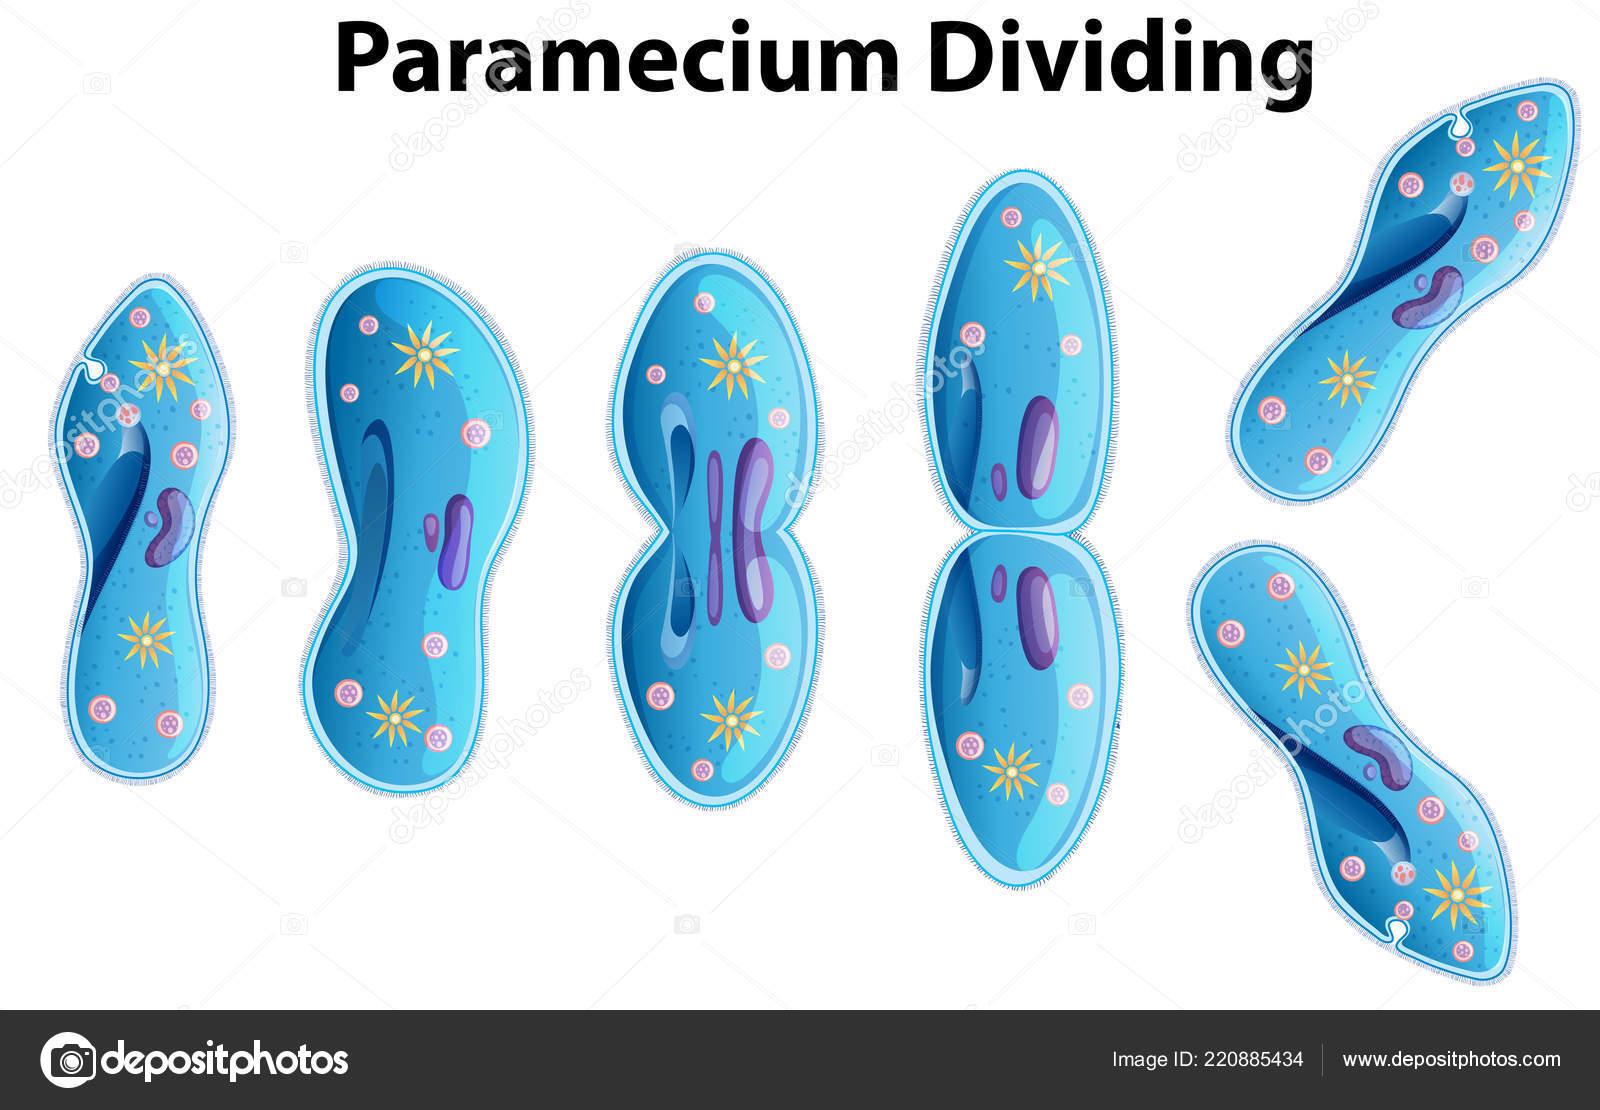 hight resolution of paramecium dividing bacteria diagram illustration stock vector